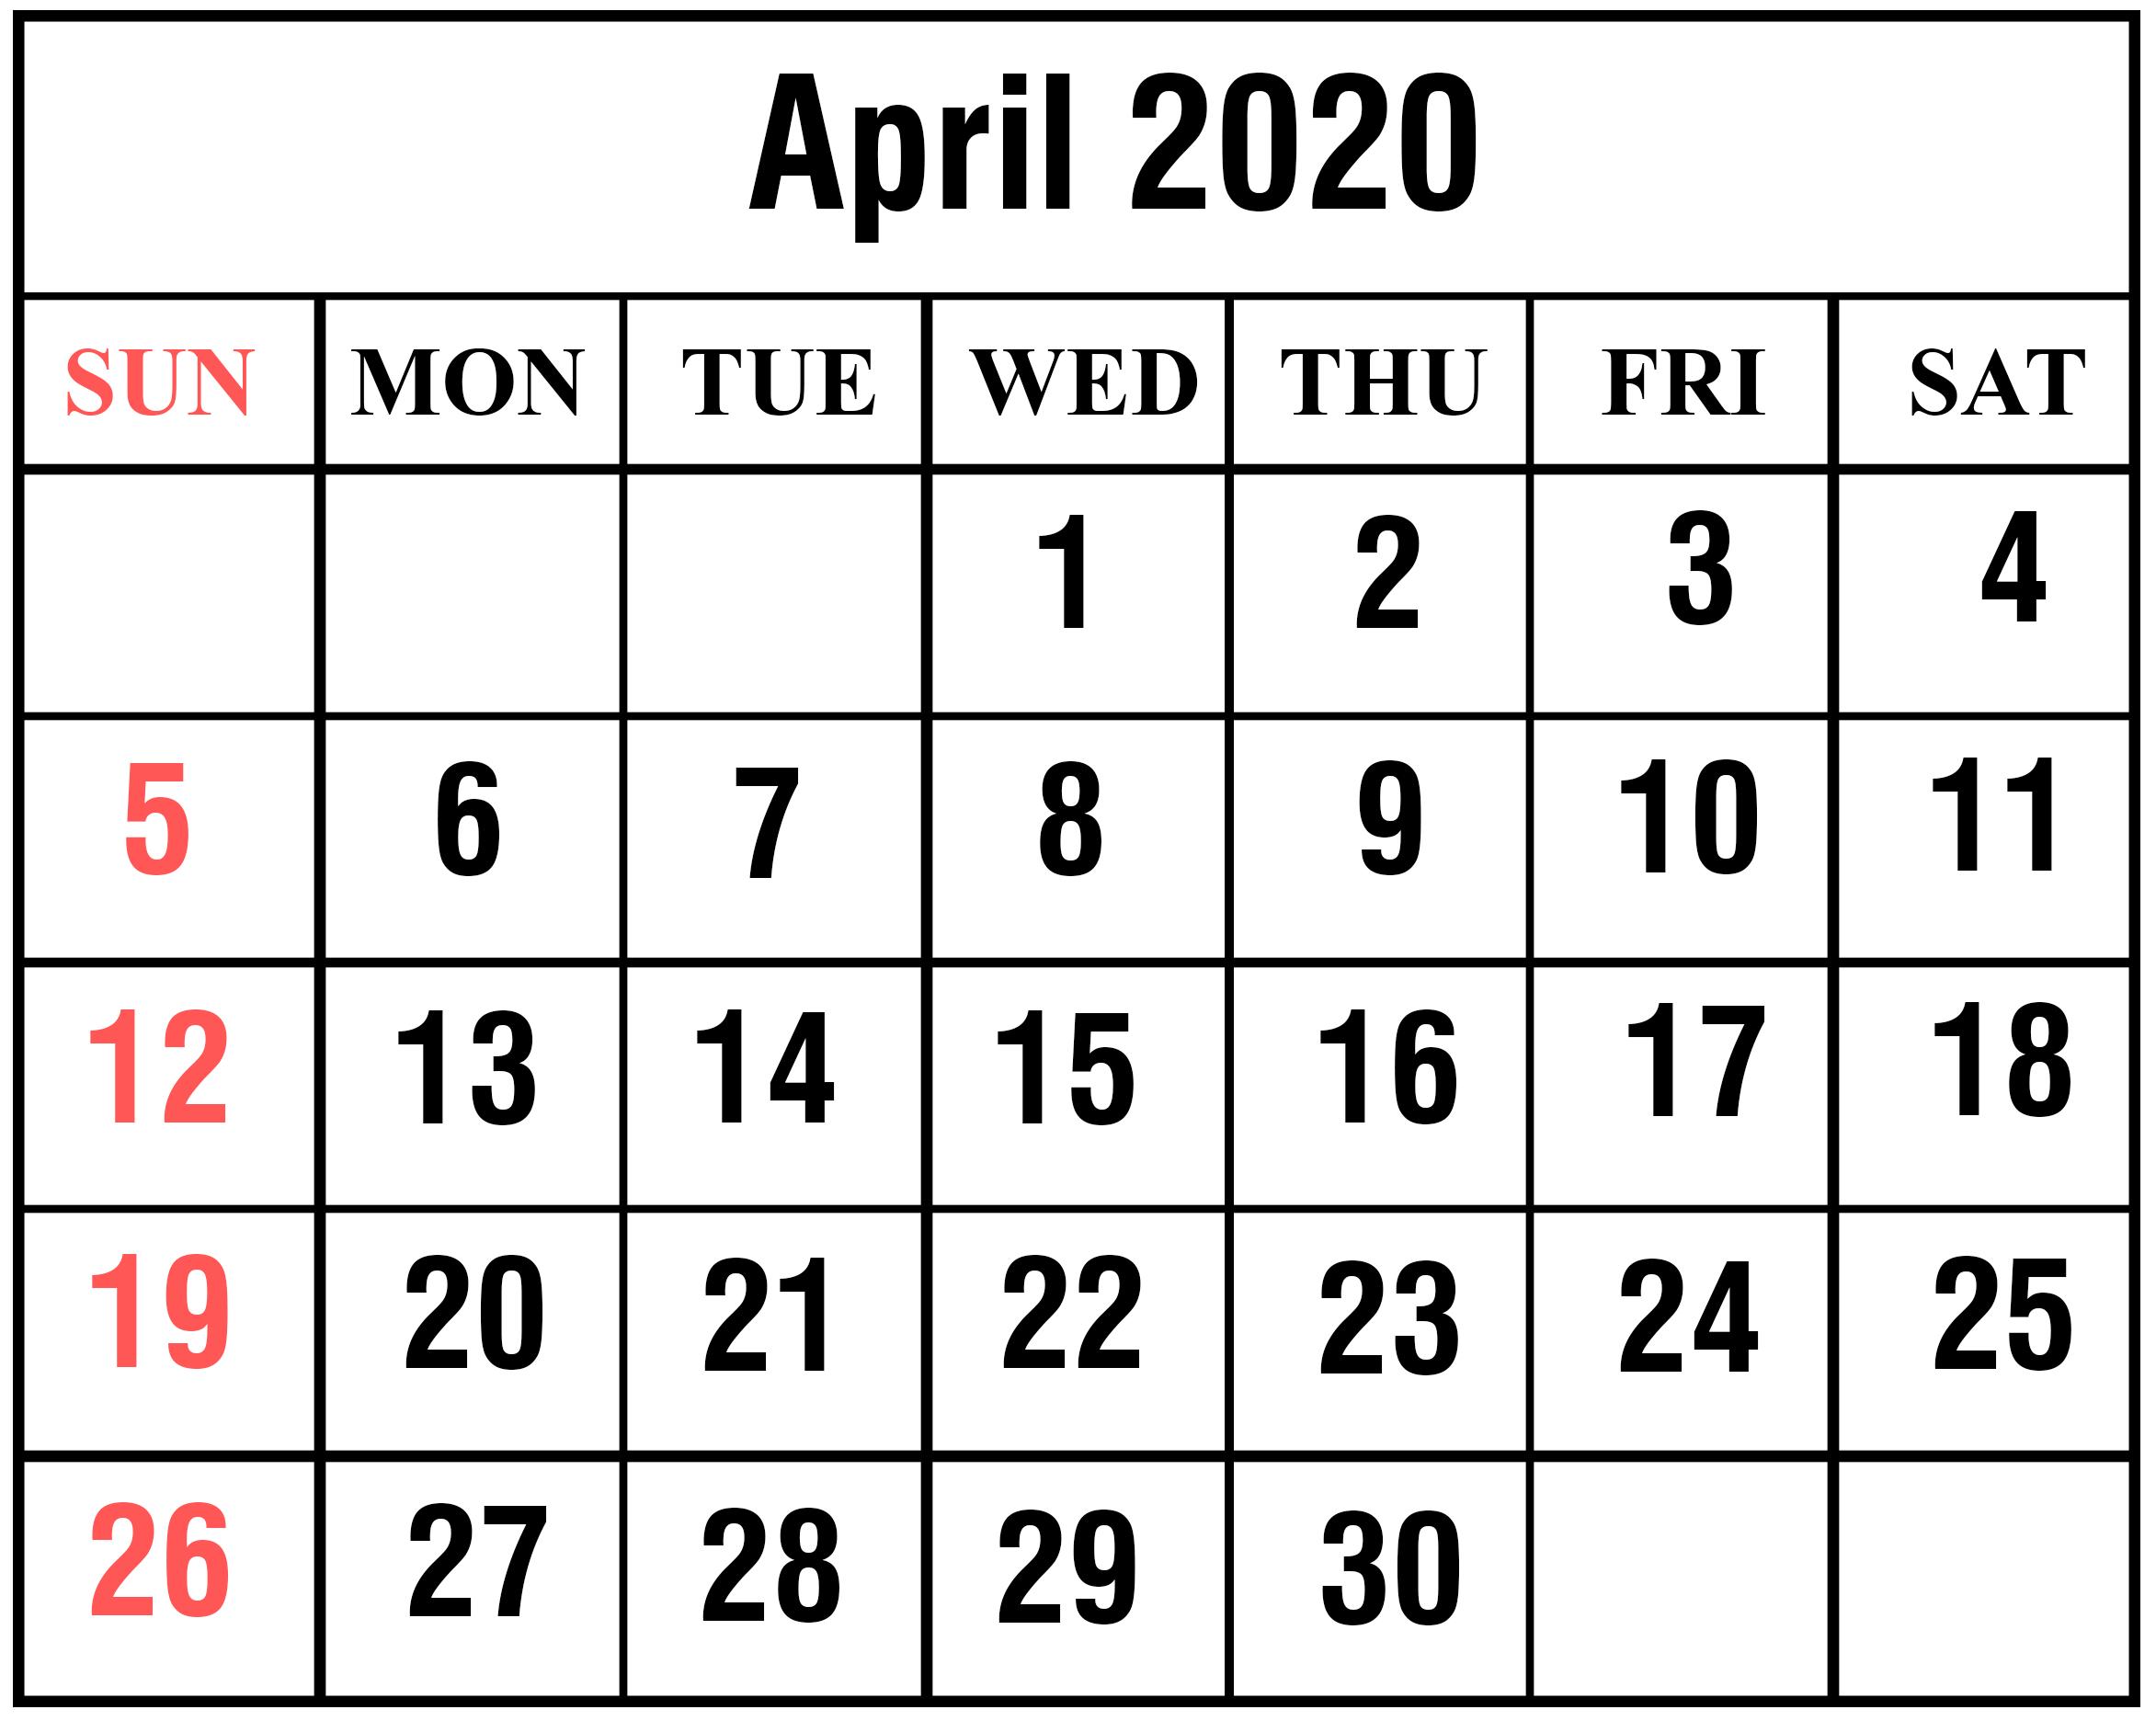 Free April 2020 Calendar Excel Pdf Download | Printable Calendar regarding Max 30 Calendar Pdf